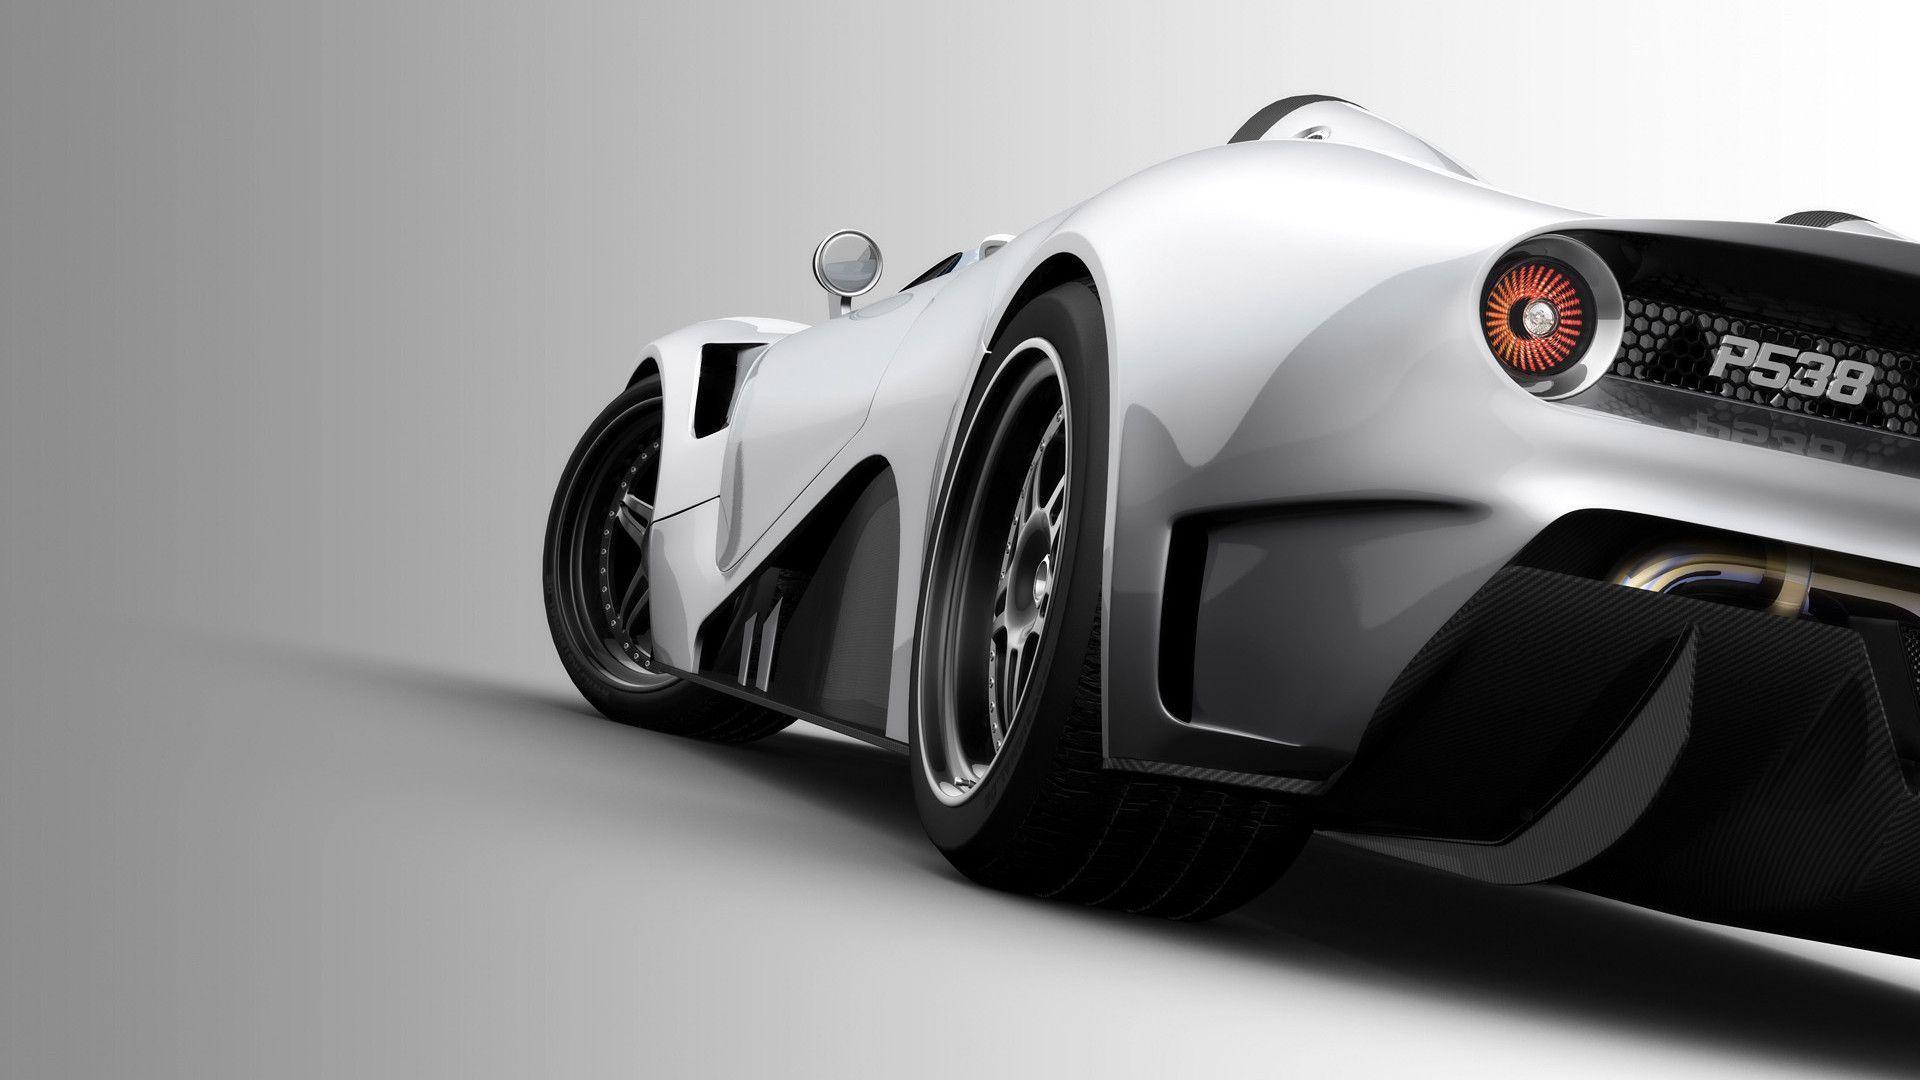 HD Cars Wallpapers 1080p Wallpaper Cave Автомобили